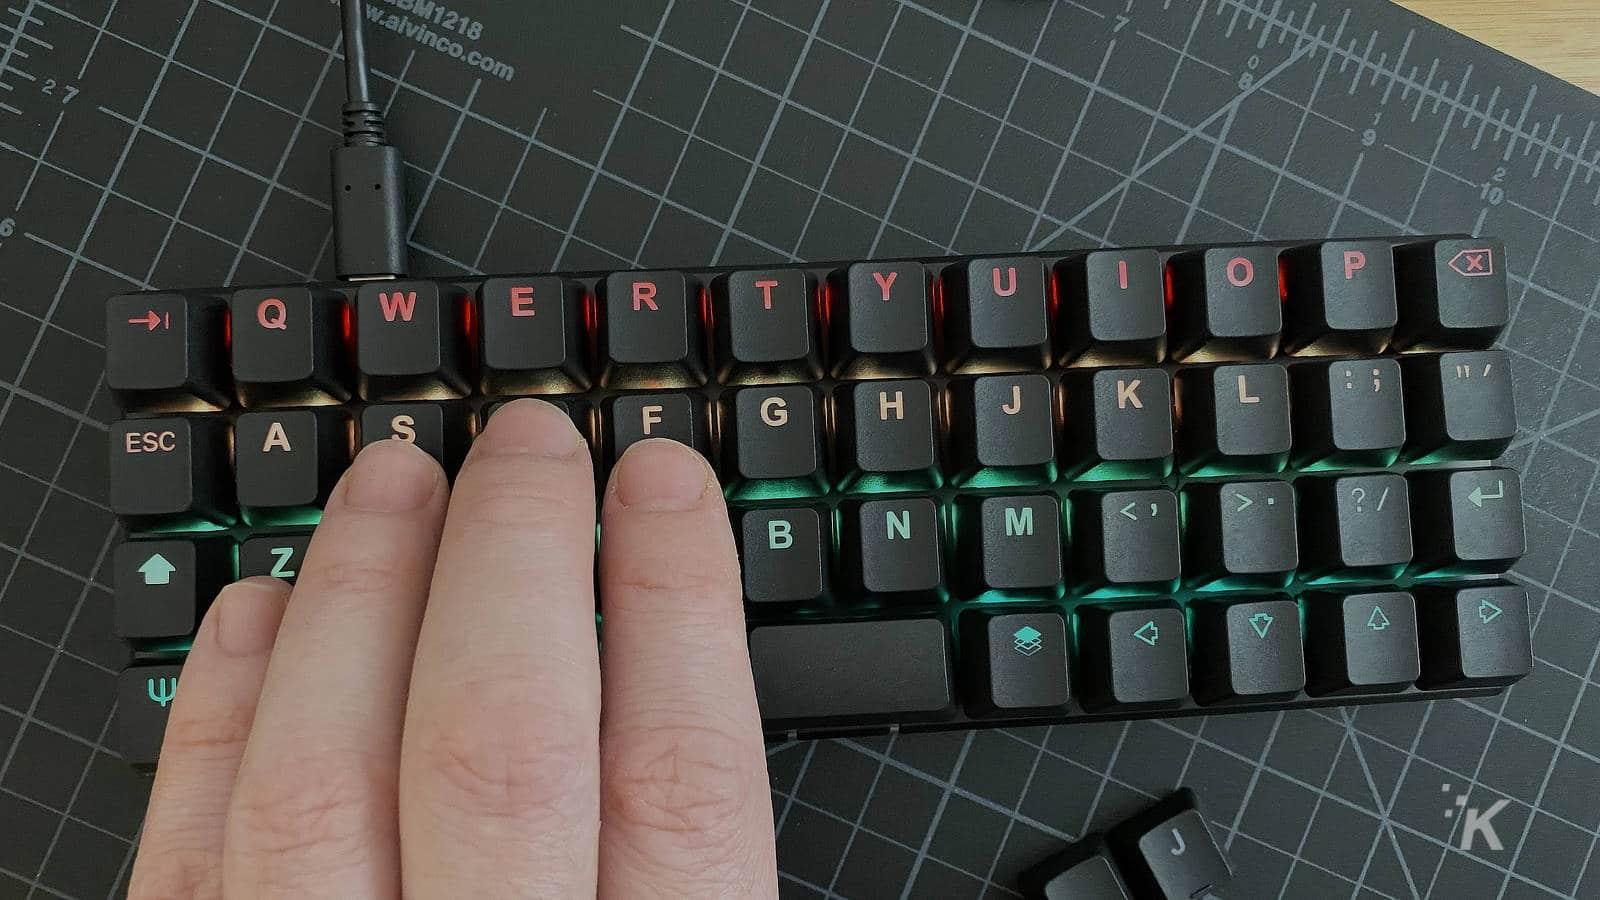 planck ez keyboard on table